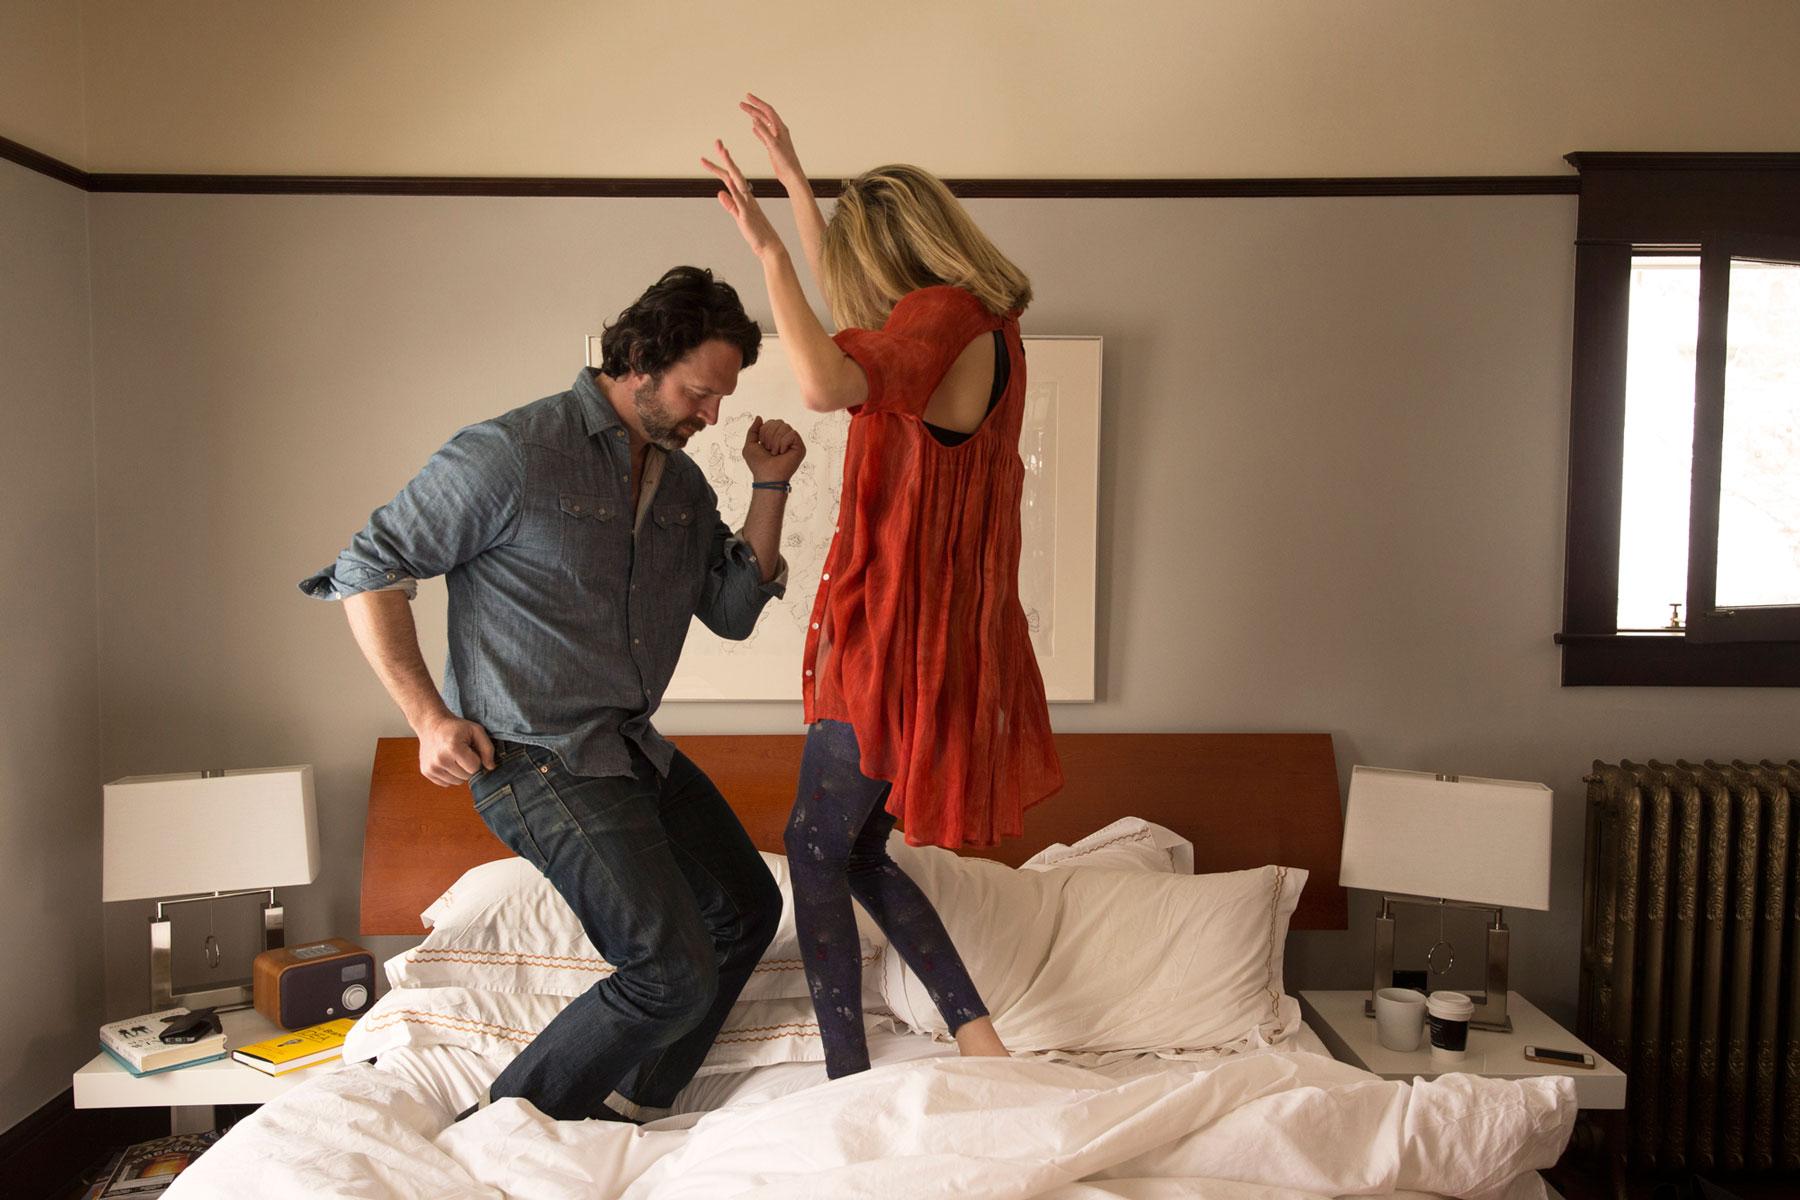 Jumping_Dancing_Bed_George_Lange_Lifestyle.jpg